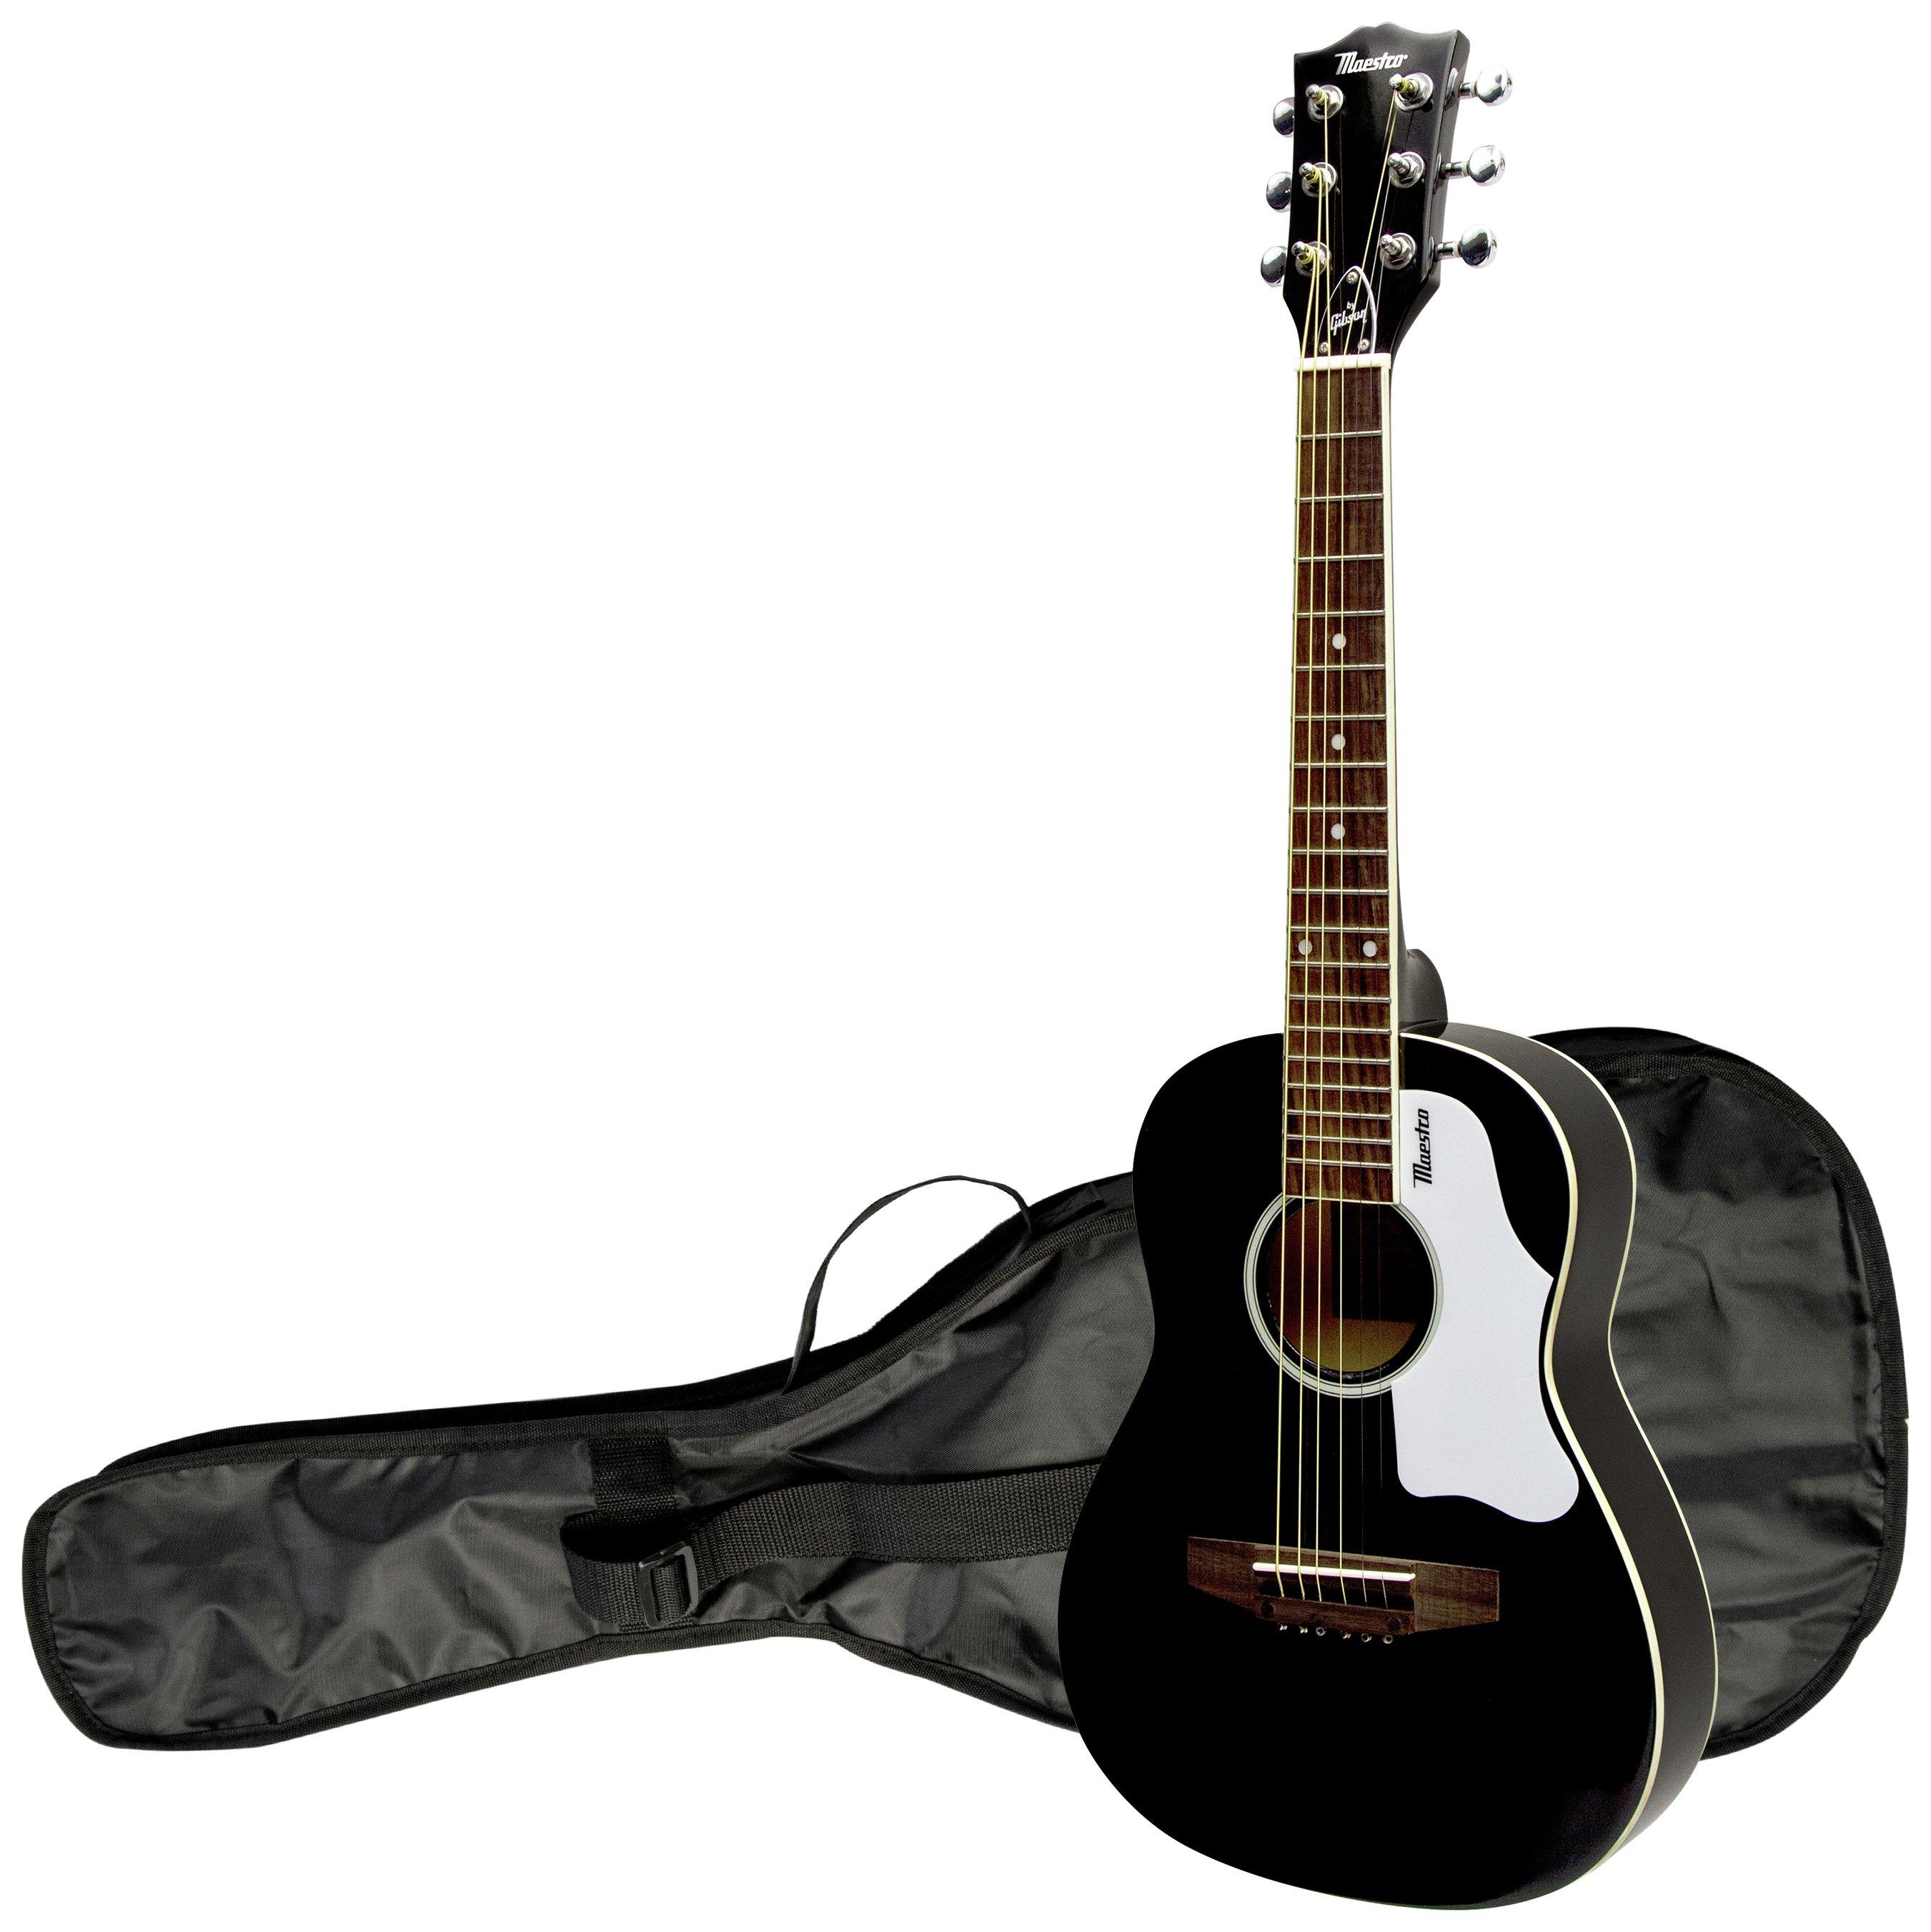 Maestro By Gibson 30 Inch Mini Guitar Black 7396205 Argos Price Tracker Pricehistory Co Uk